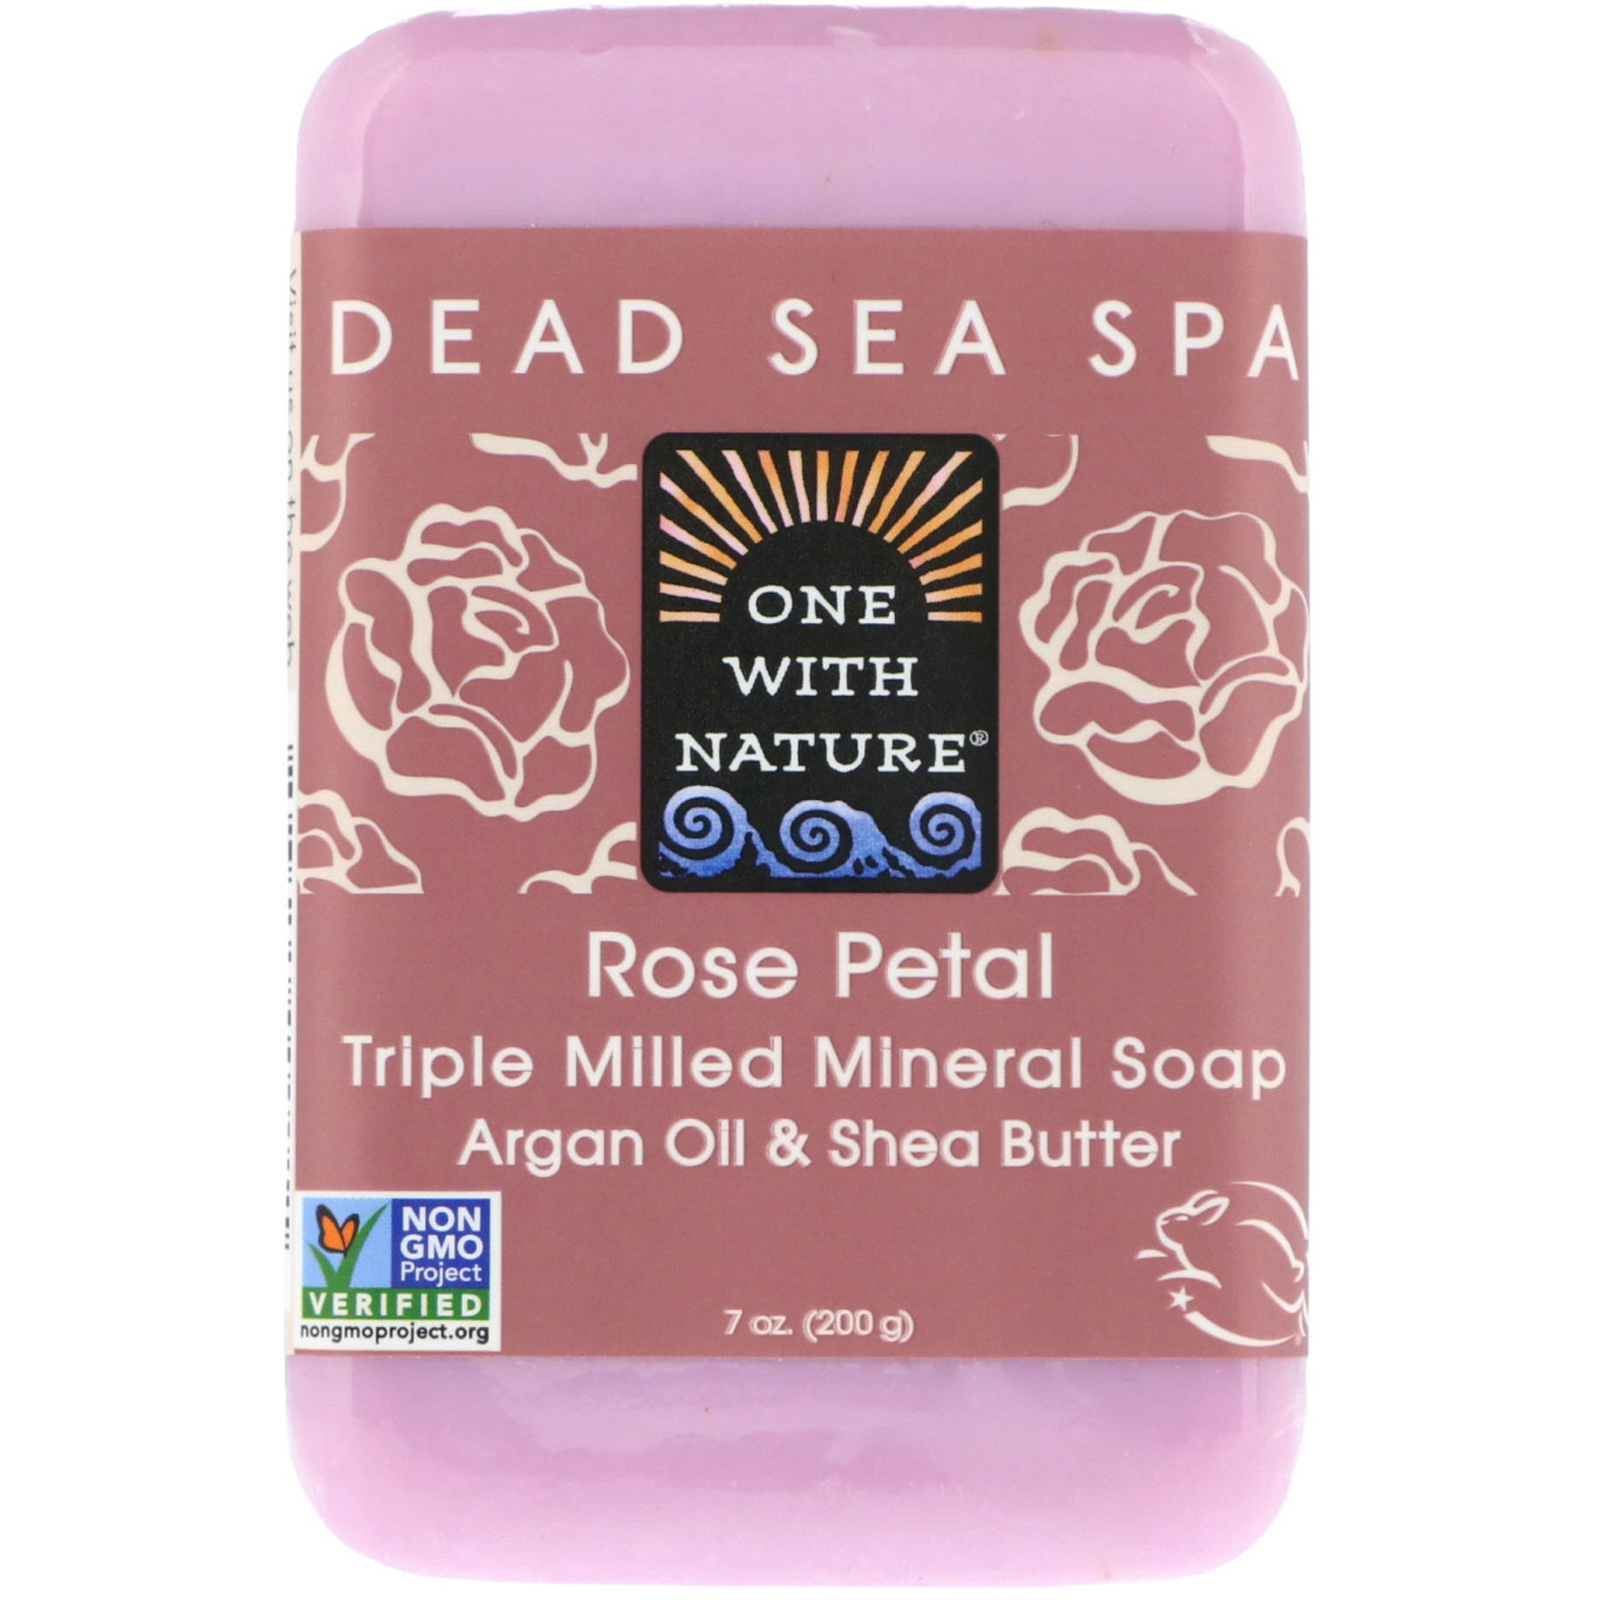 Bar of natural soap made with rose petals